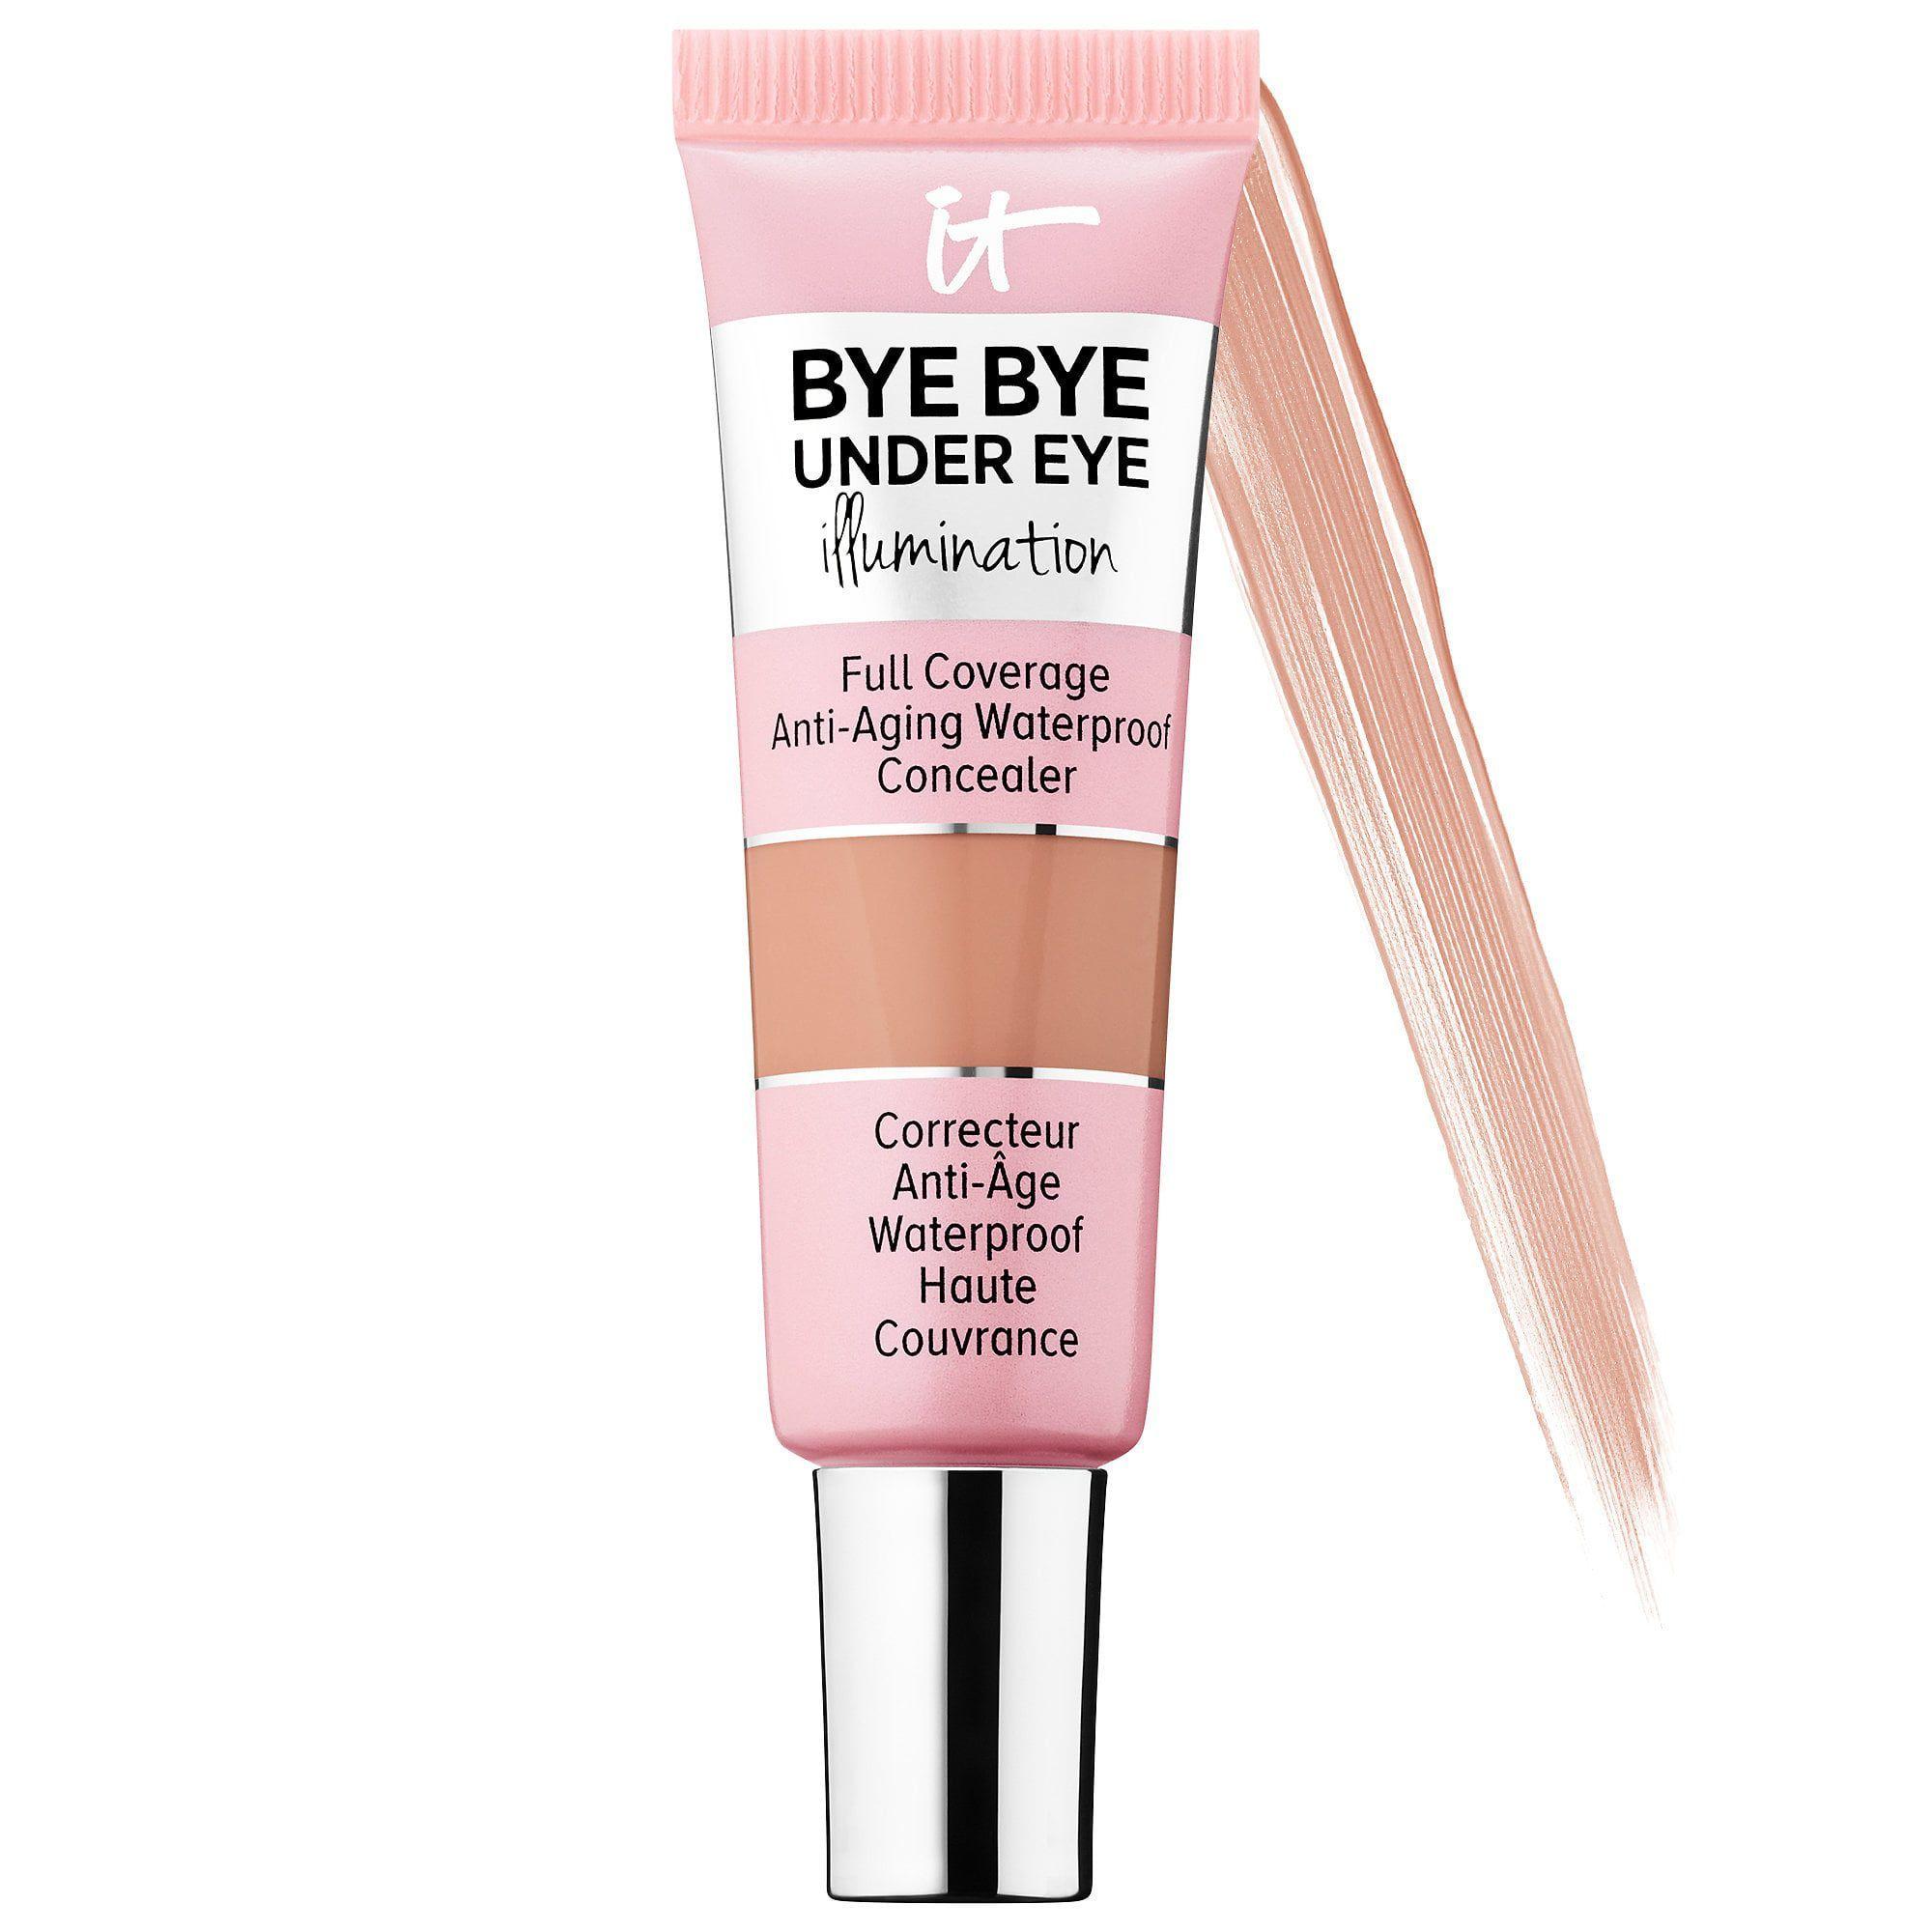 Bye Bye Under Eye Illumination™ Full Coverage AntiAging